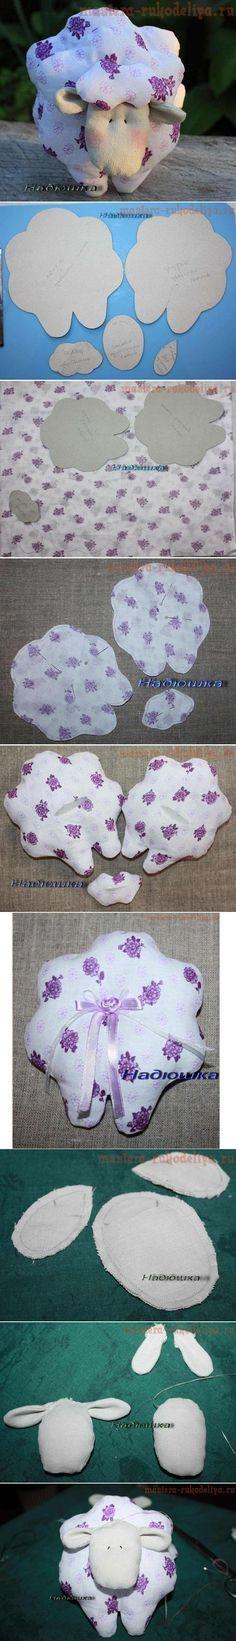 DIY Fabric Sheep Toy DIY Fabric Sheep Toy